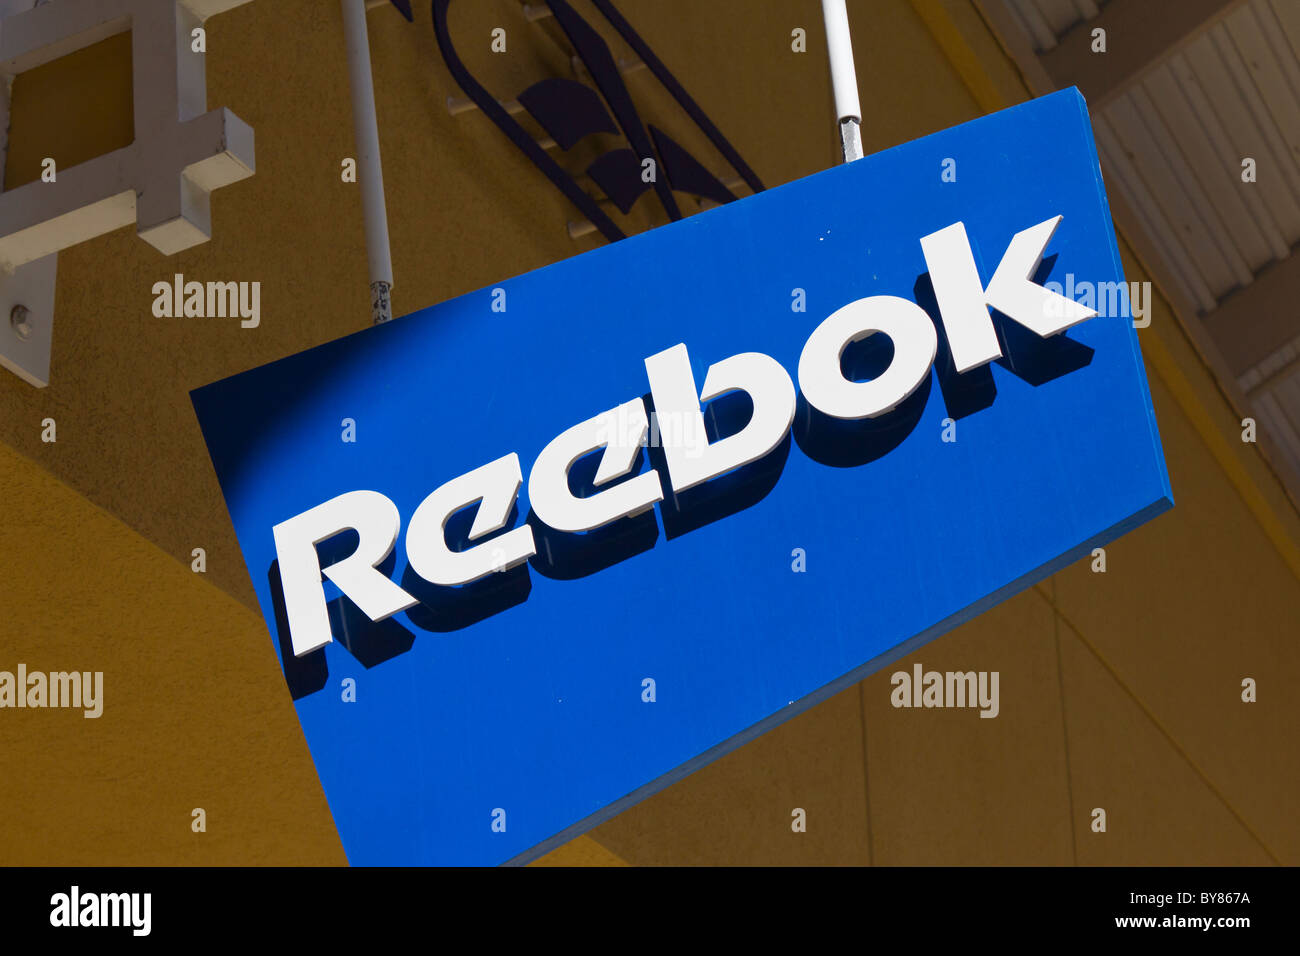 Reebok Store Stock Photos   Reebok Store Stock Images - Alamy 2cc20d51a